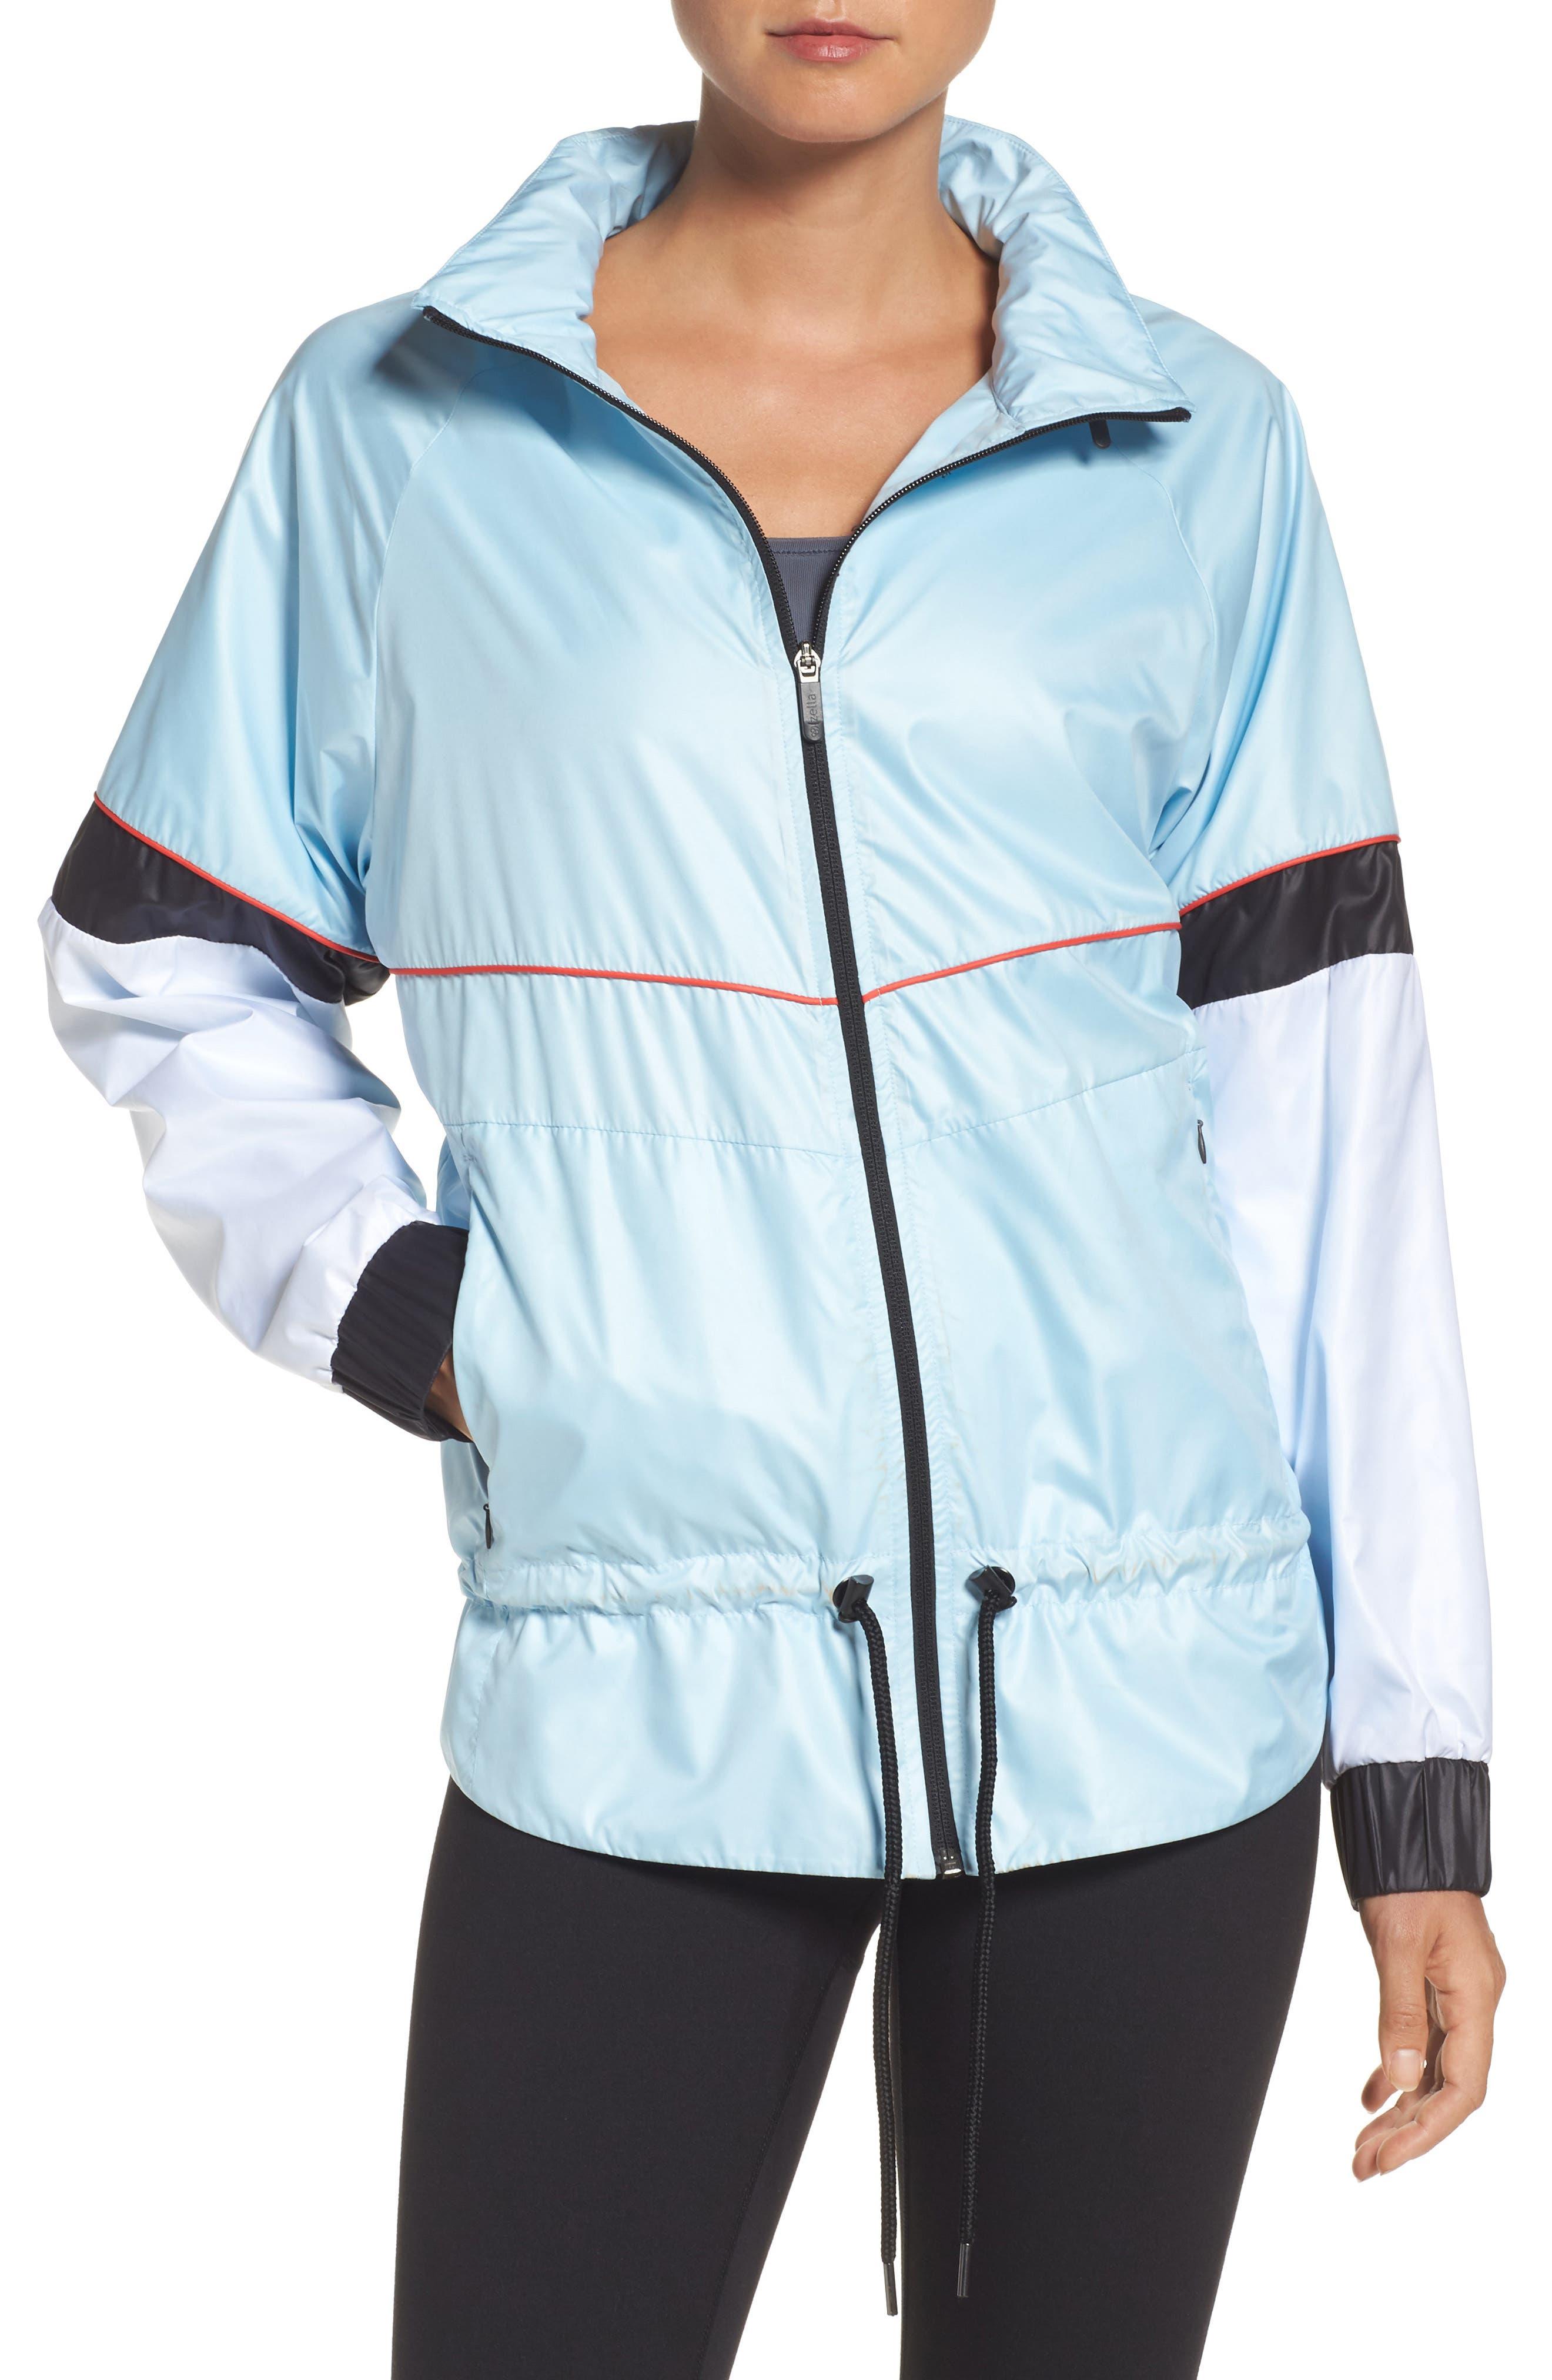 Shadowboxer Jacket,                         Main,                         color, Blue Omphalodes